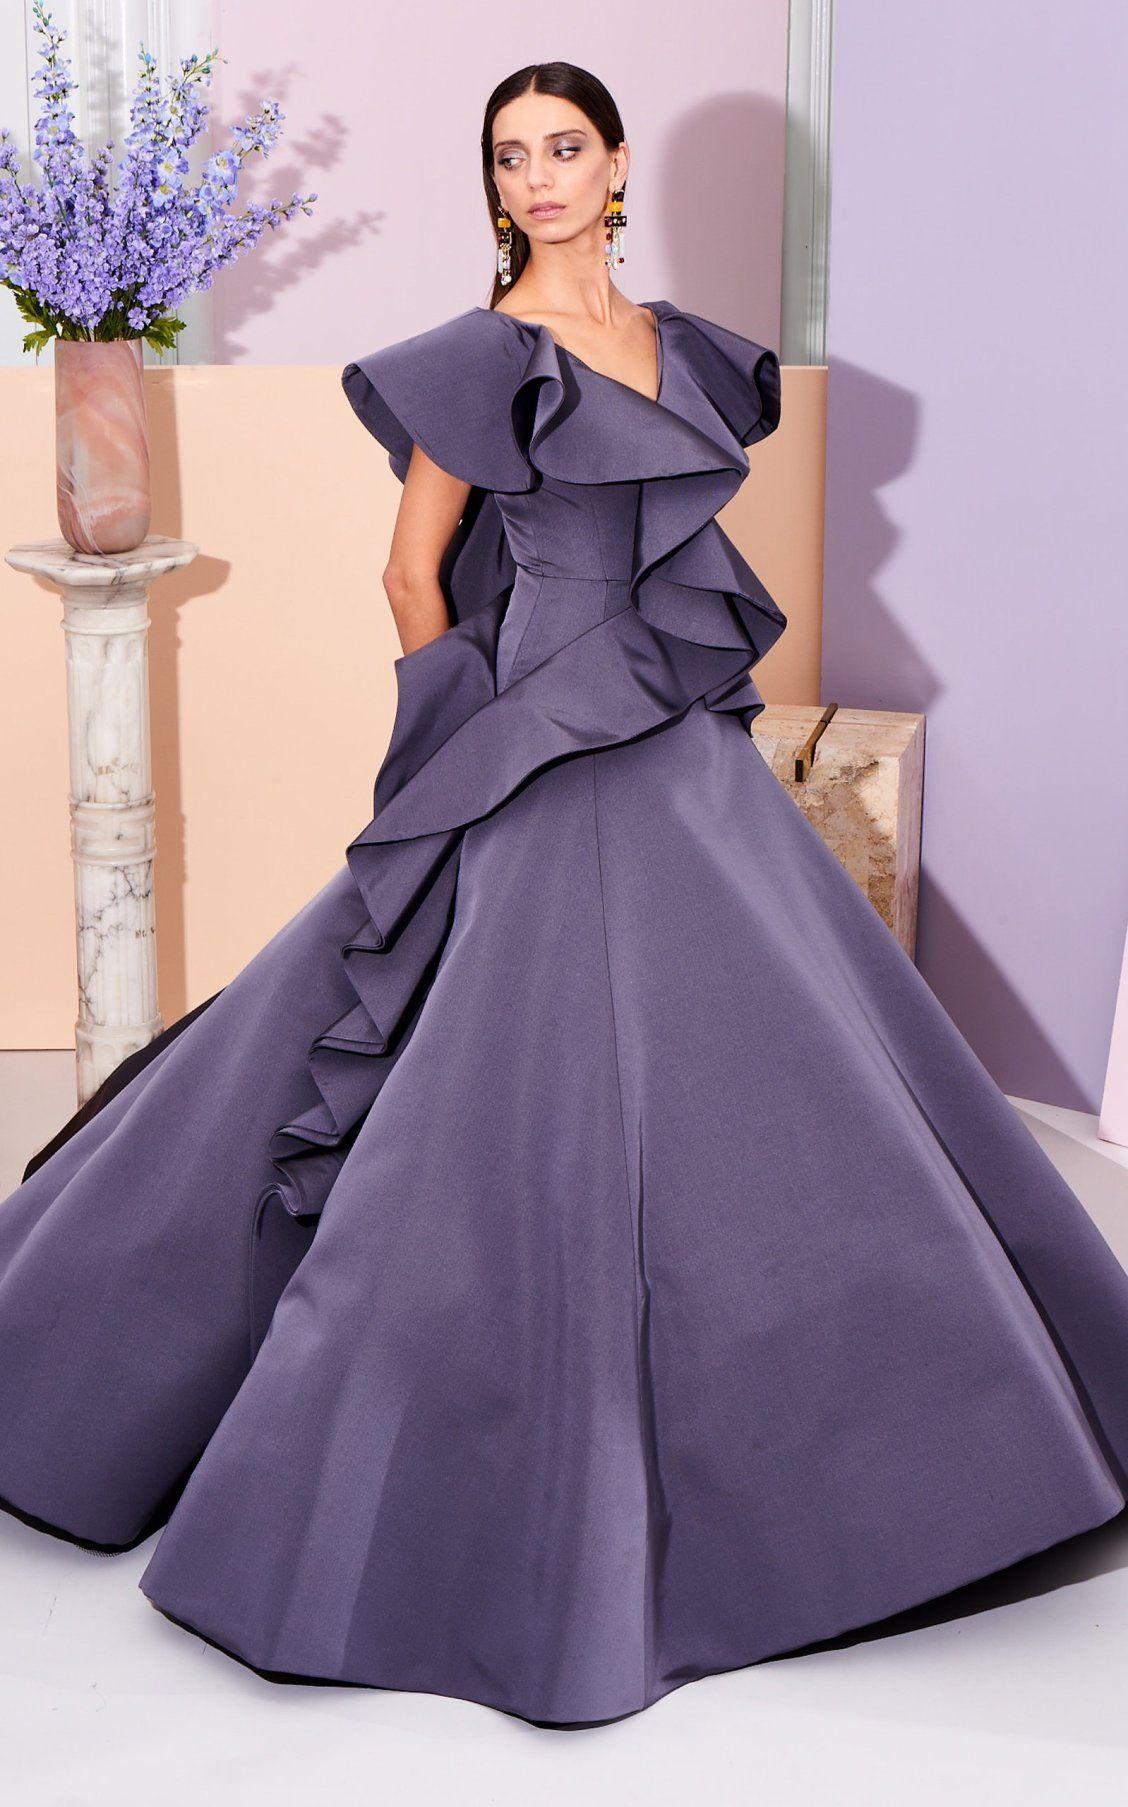 Ruffled Bodice Gown By Christian Siriano Pf19 Moda Operandi Couture Gowns Christian Siriano Dress Up